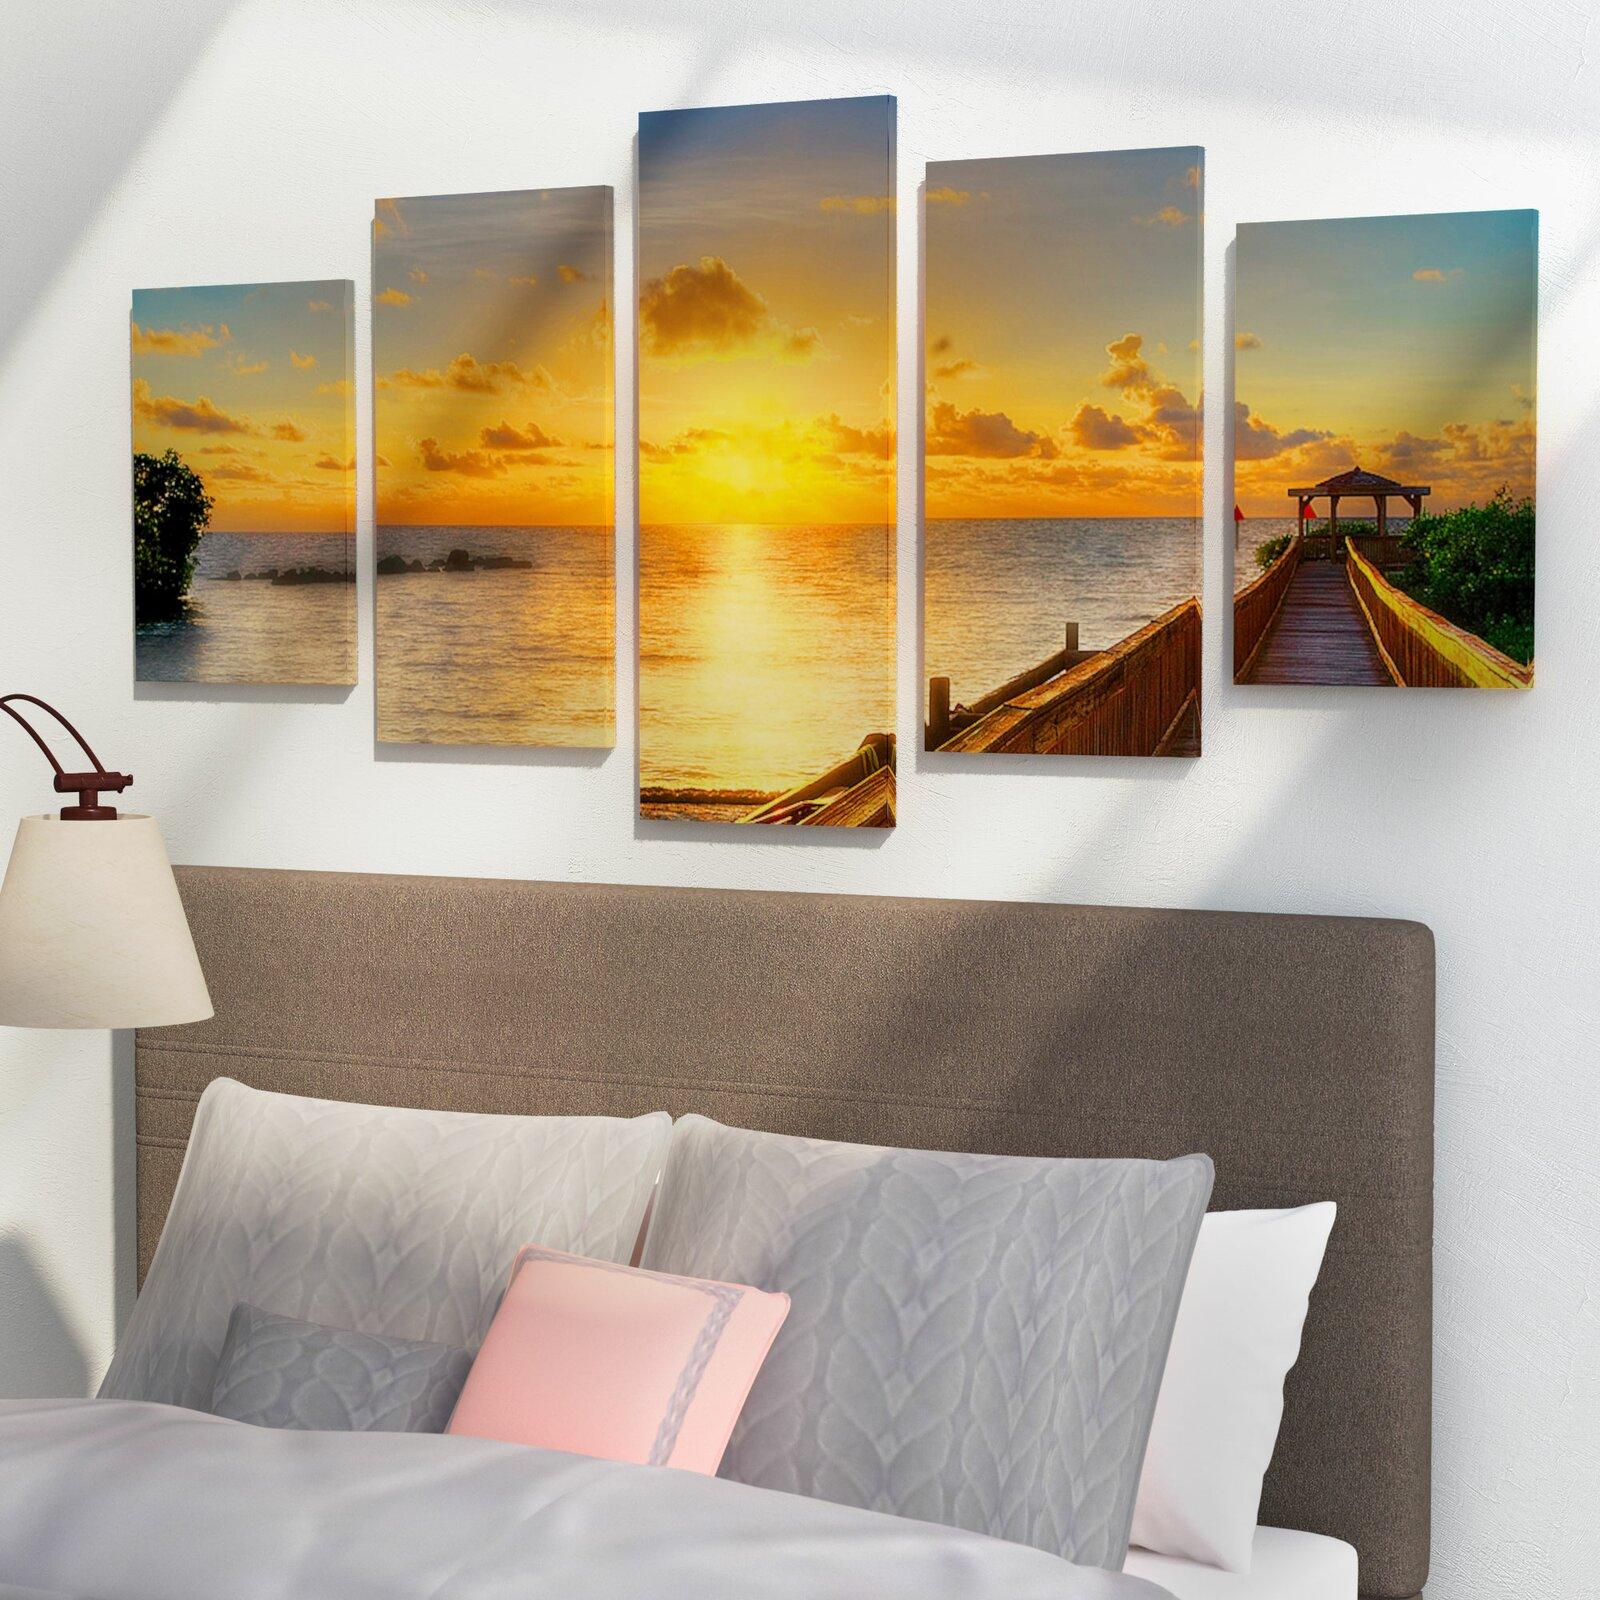 Key Sunrise by Bruce Bain 5 Piece Wrapped Canvas